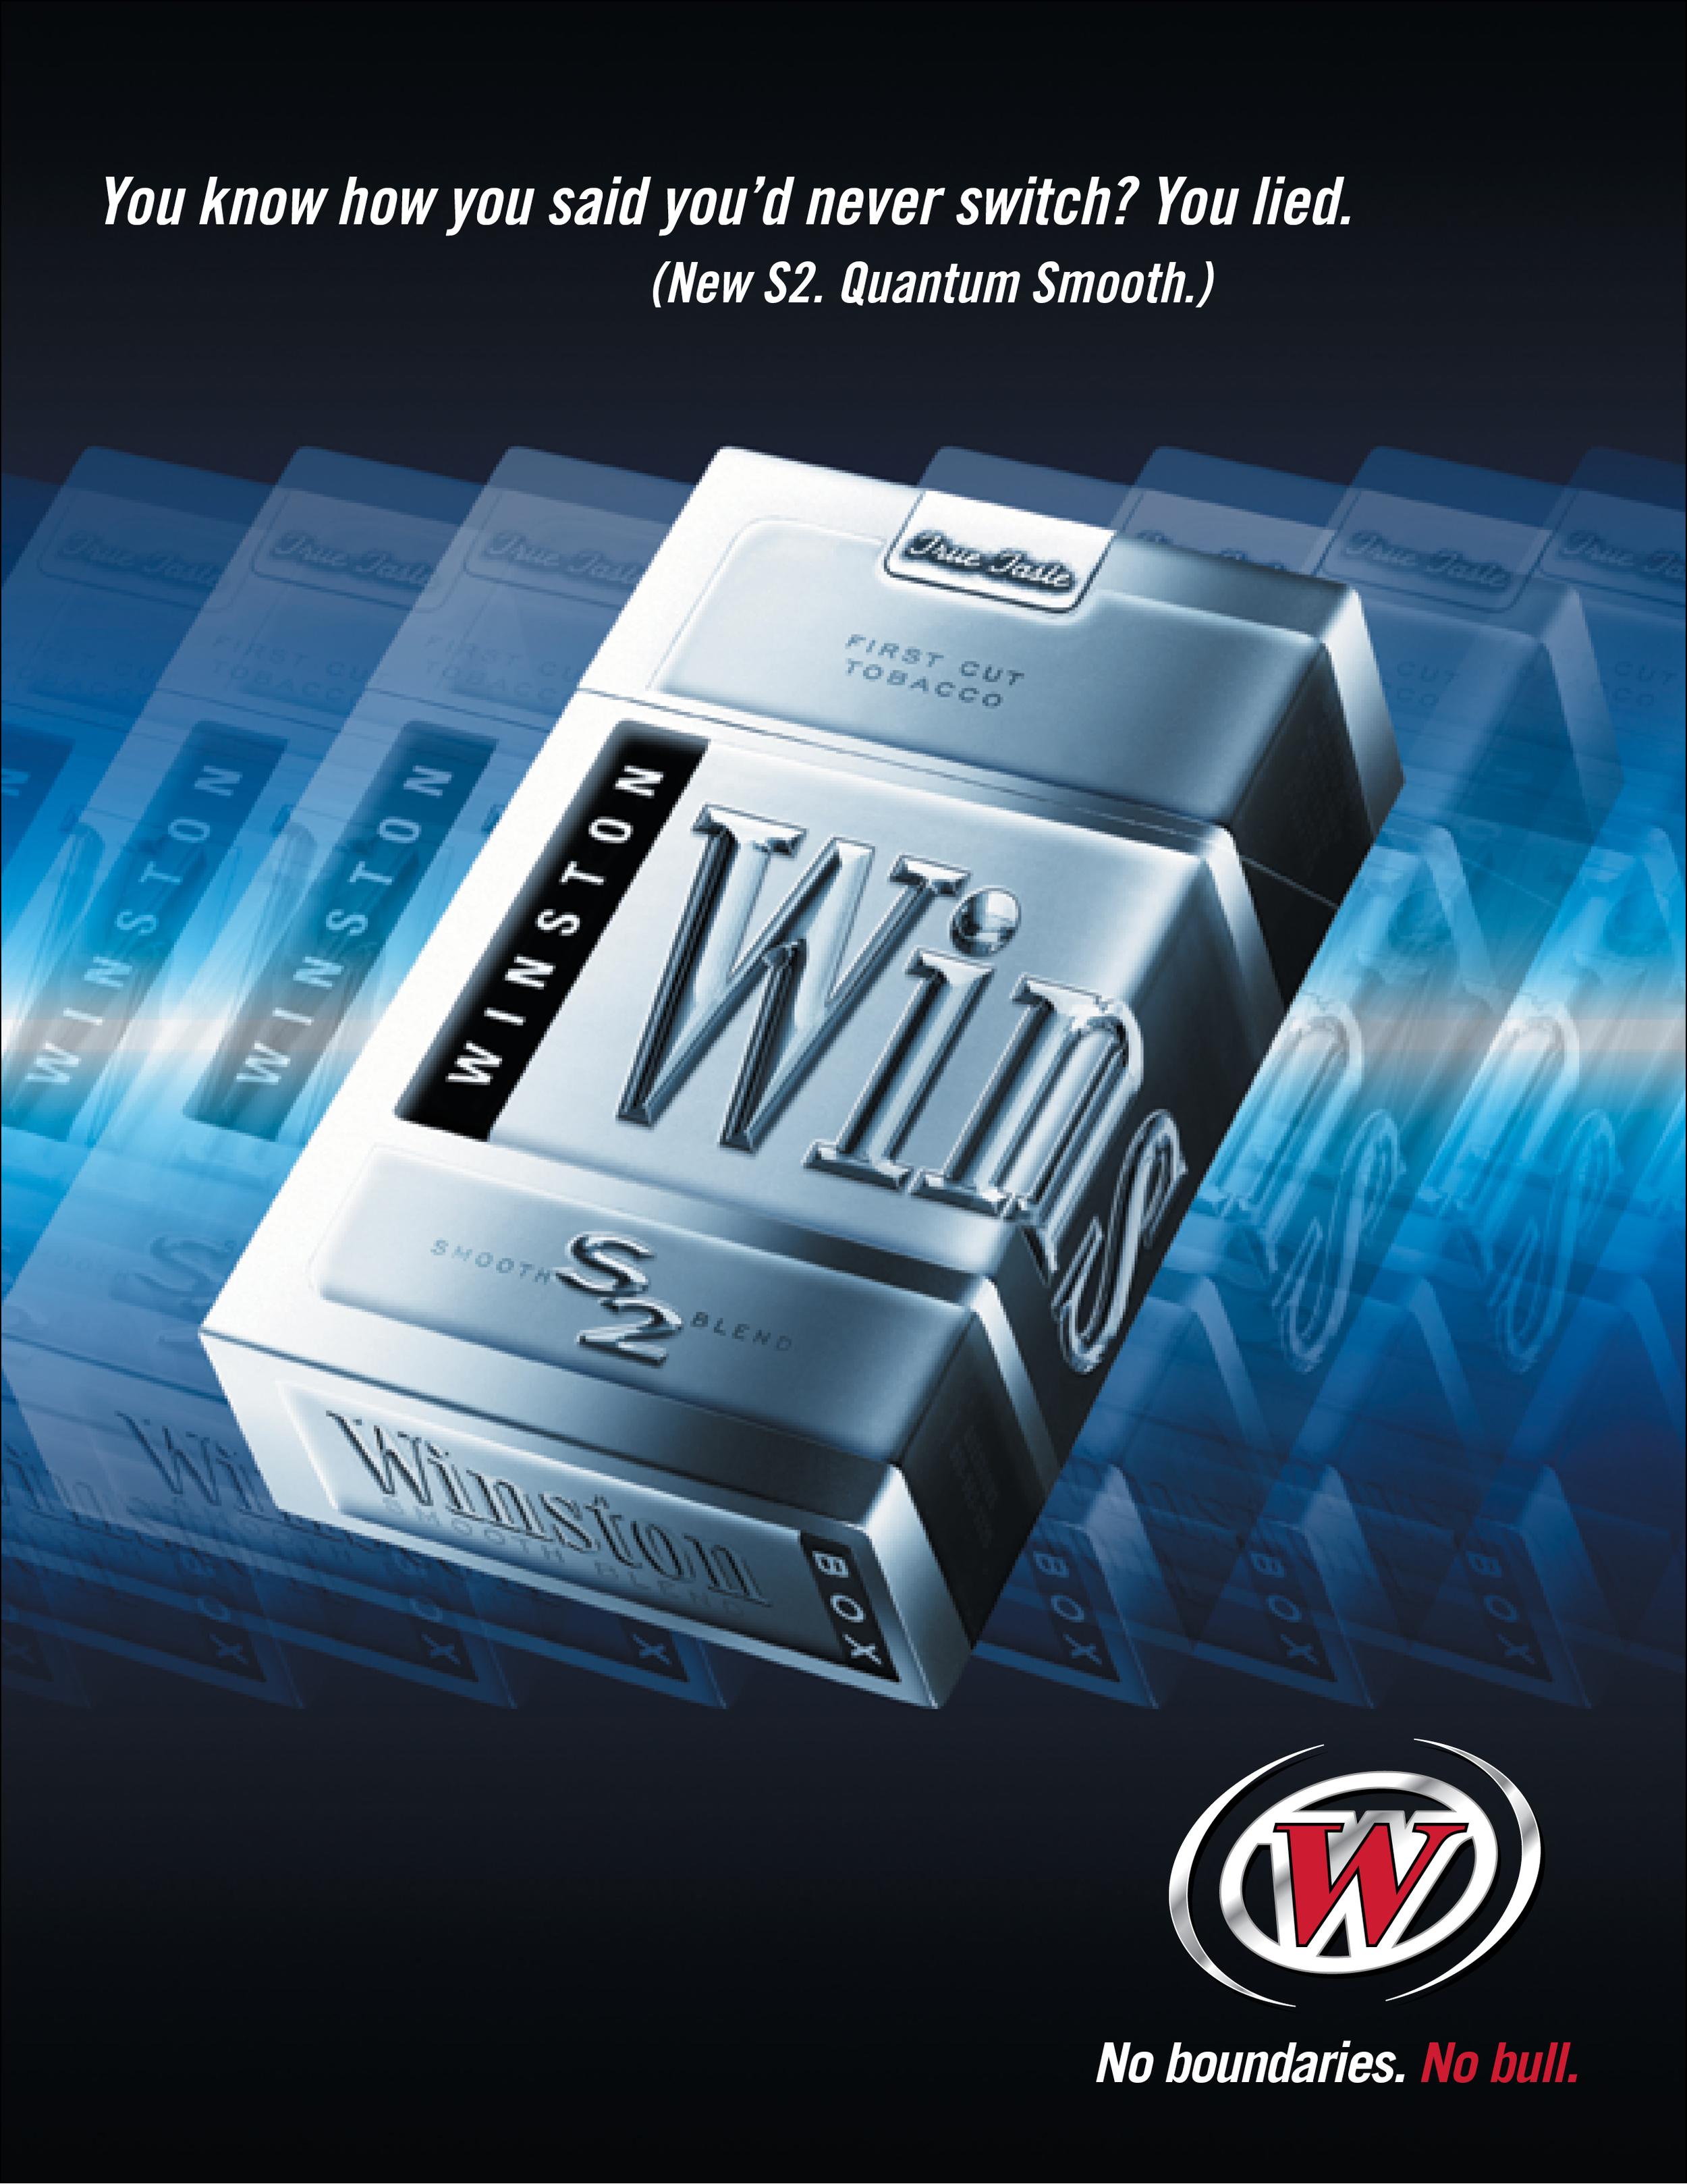 Winston_Ads_single.jpg